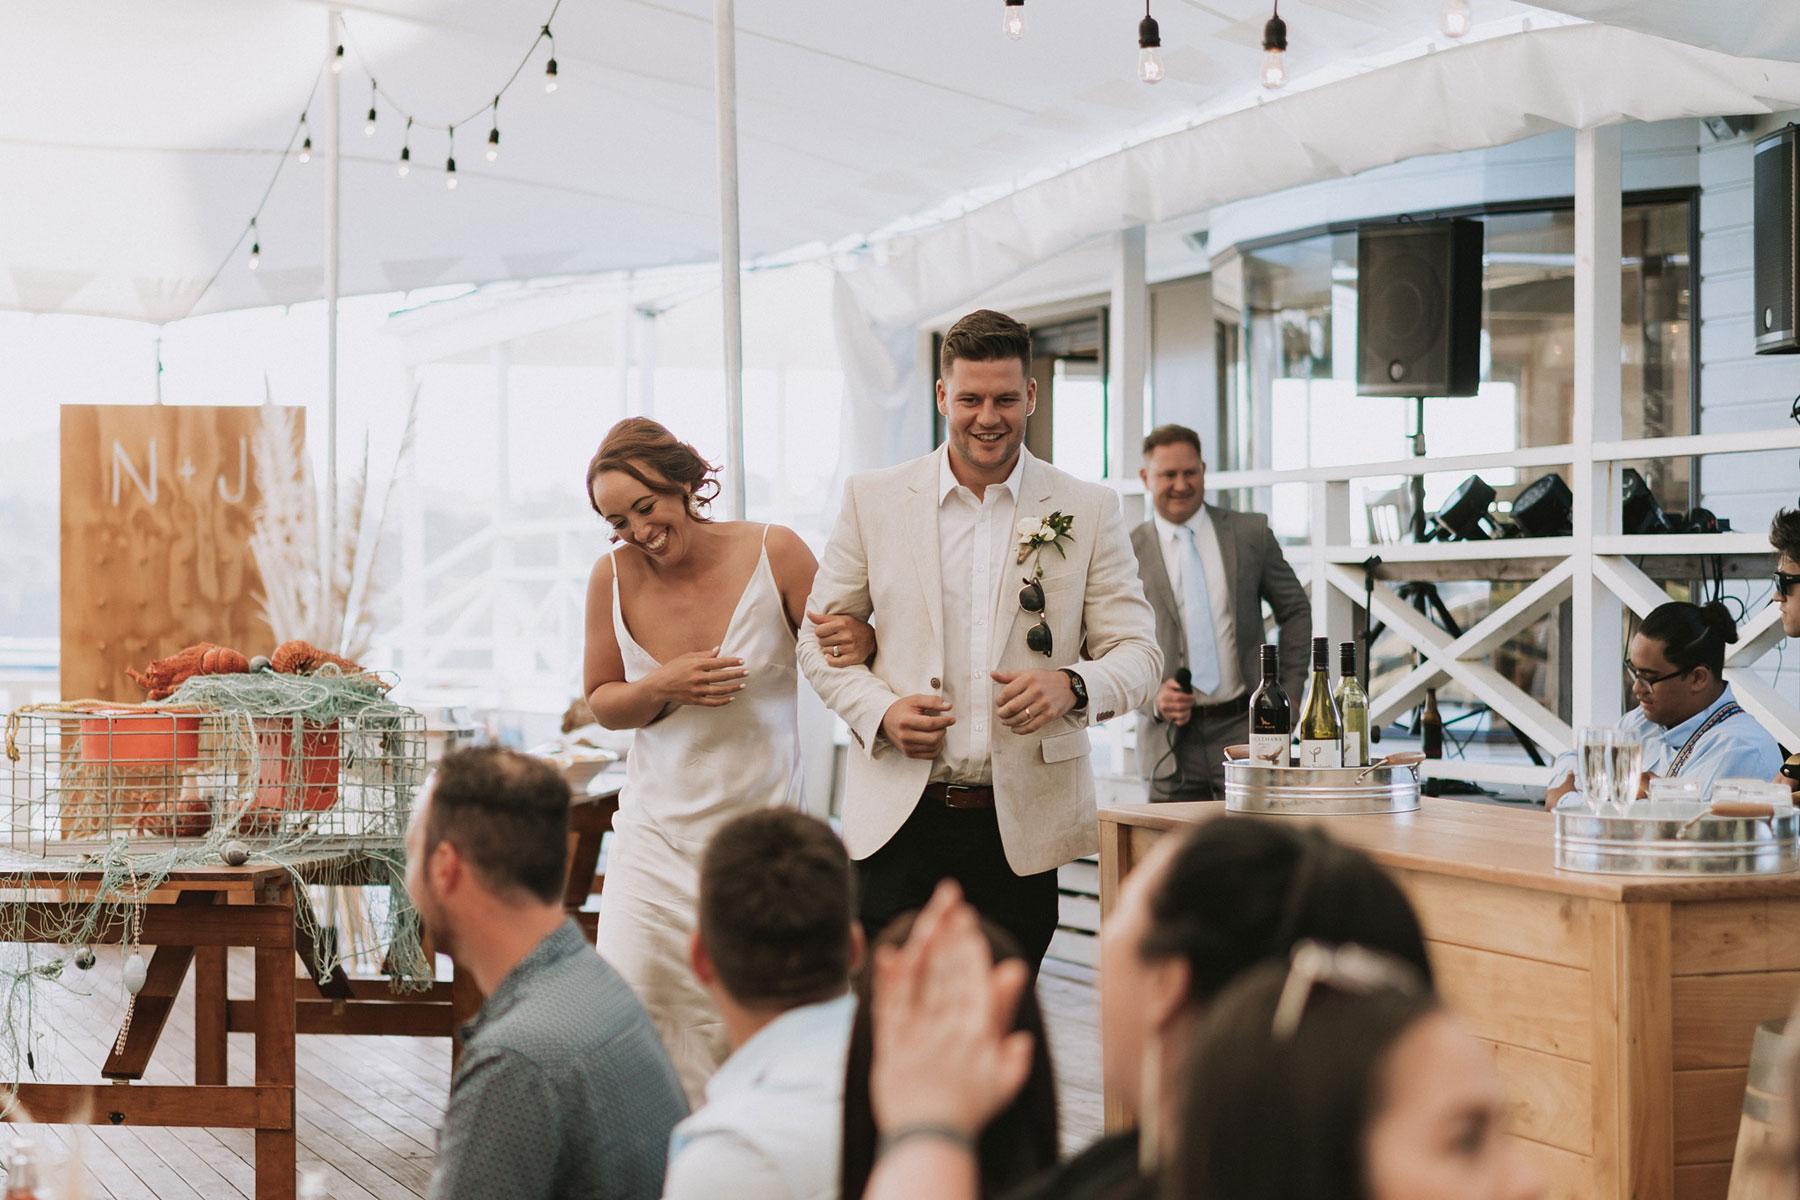 newfound-j-n-orua-beach-house-coromandel-wedding-photographers-616